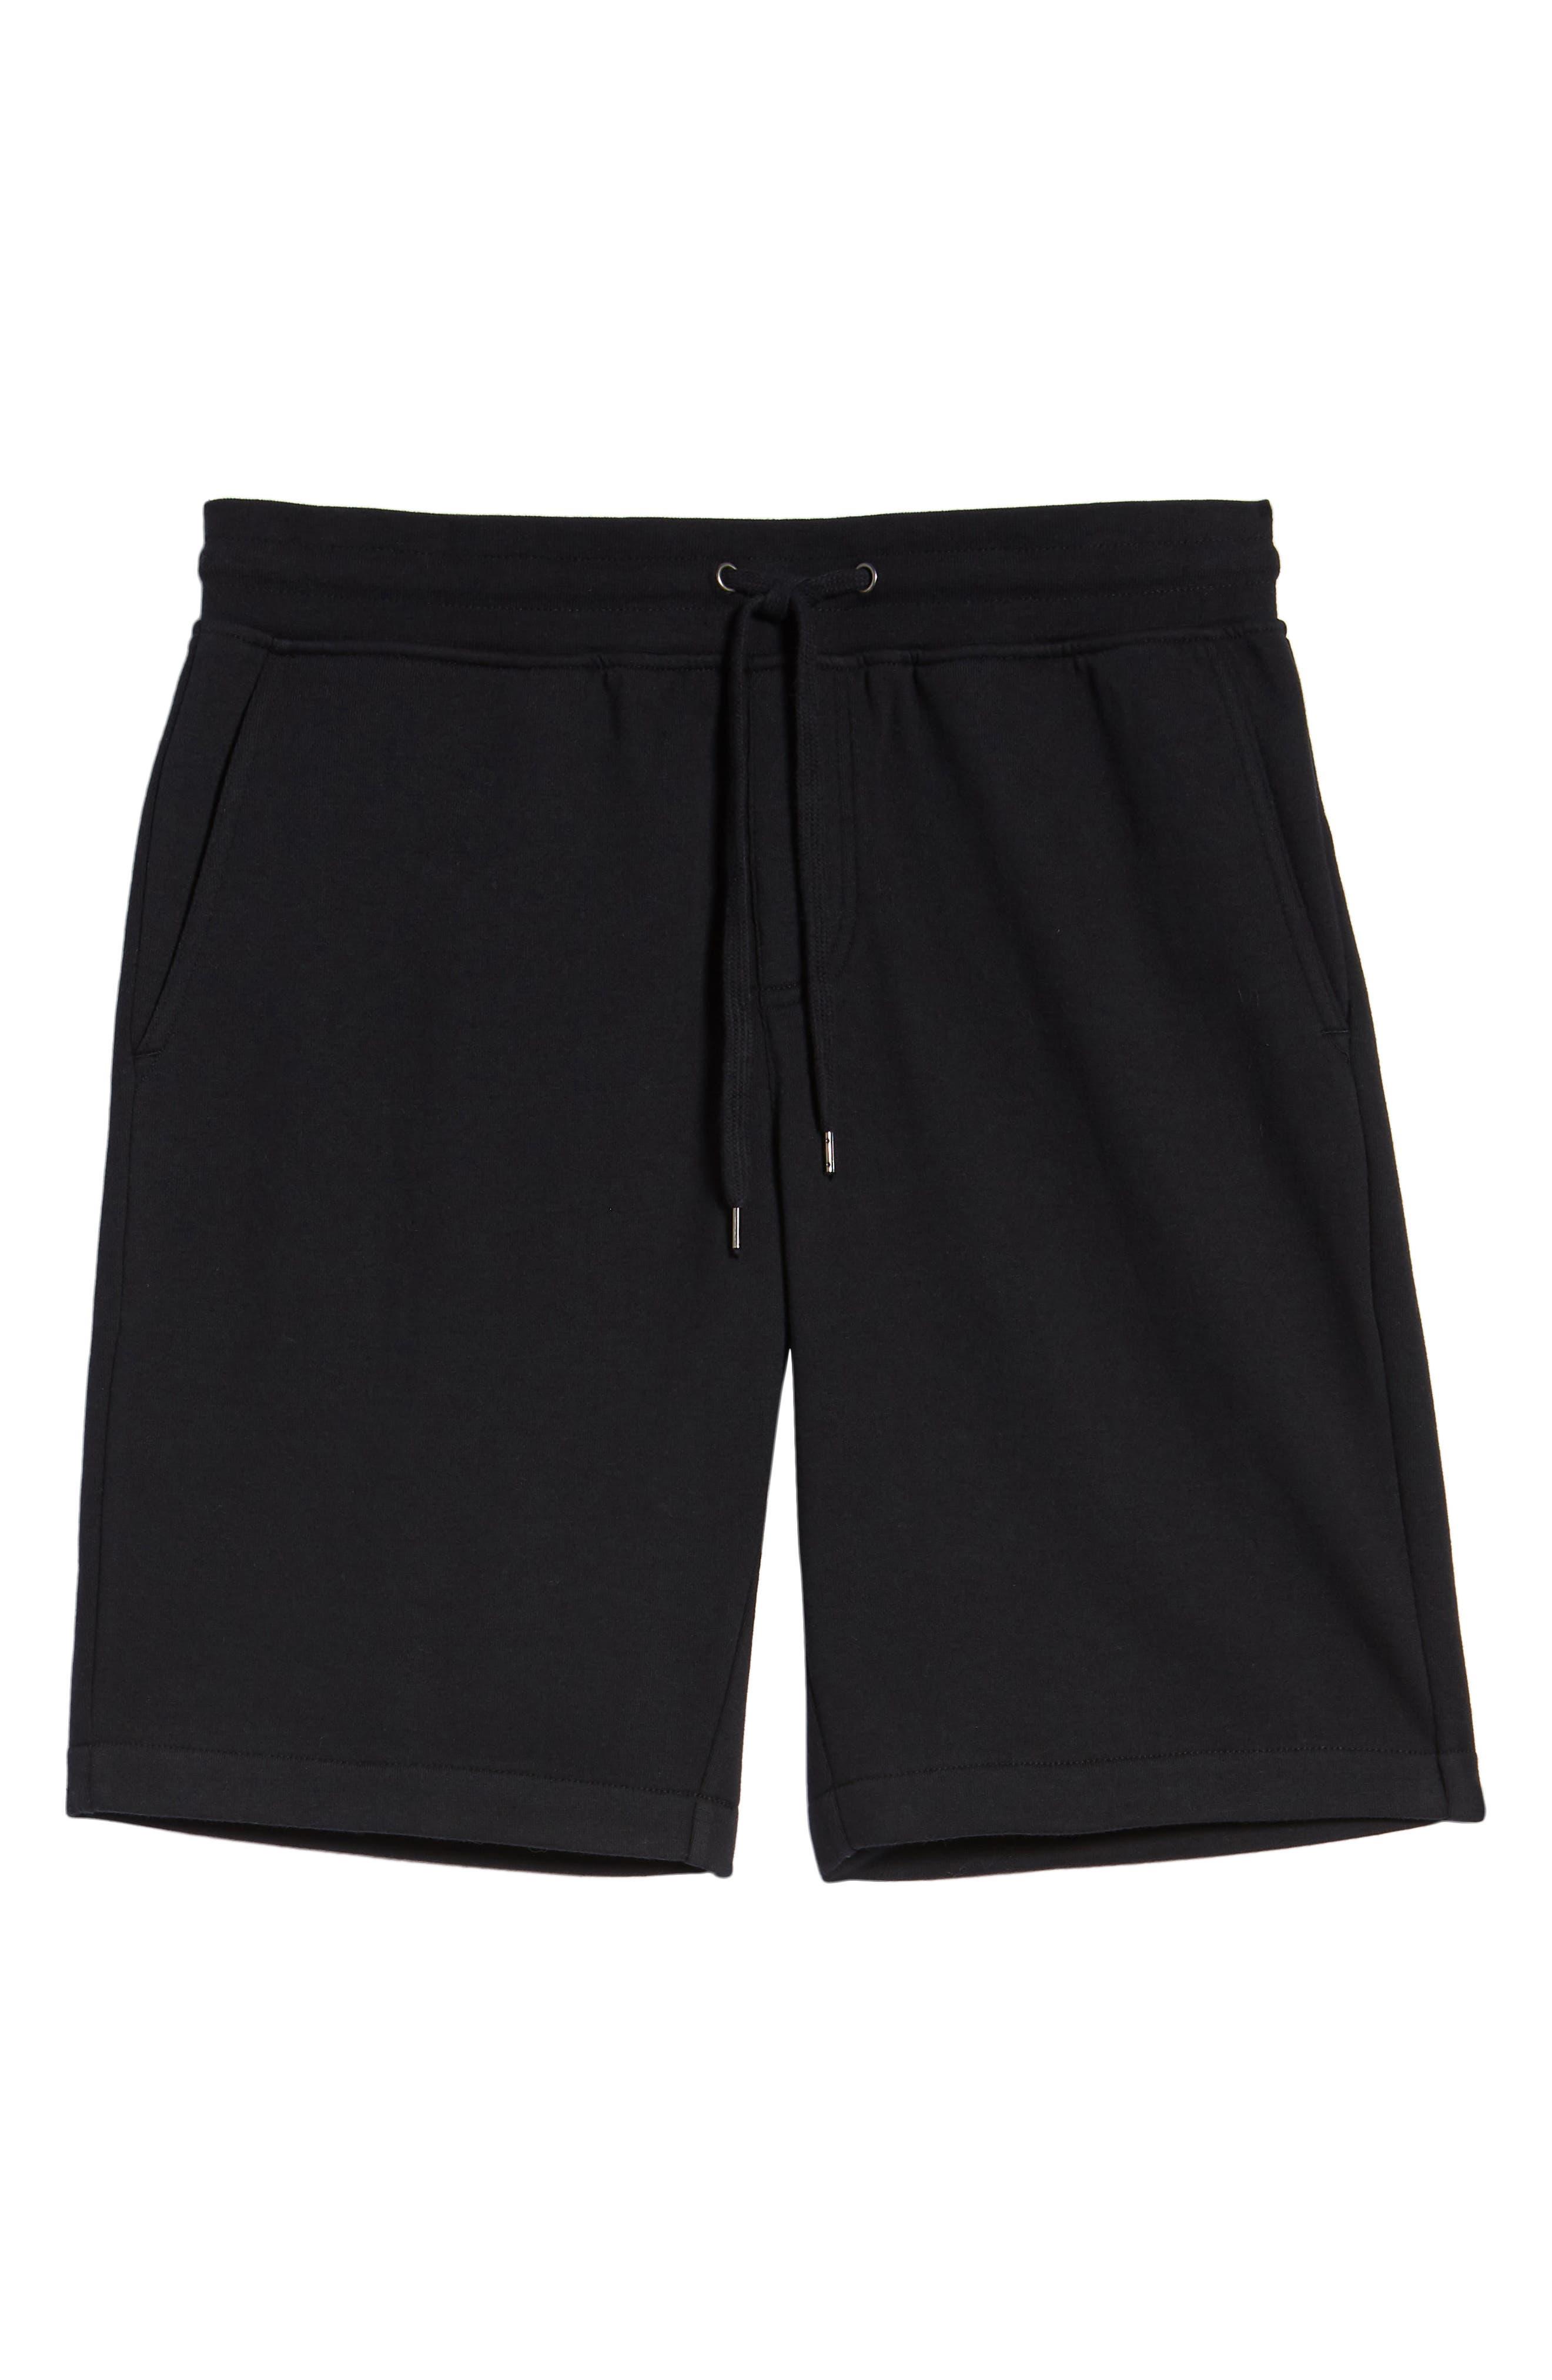 THE RAIL,                             Fleece Shorts,                             Alternate thumbnail 6, color,                             001